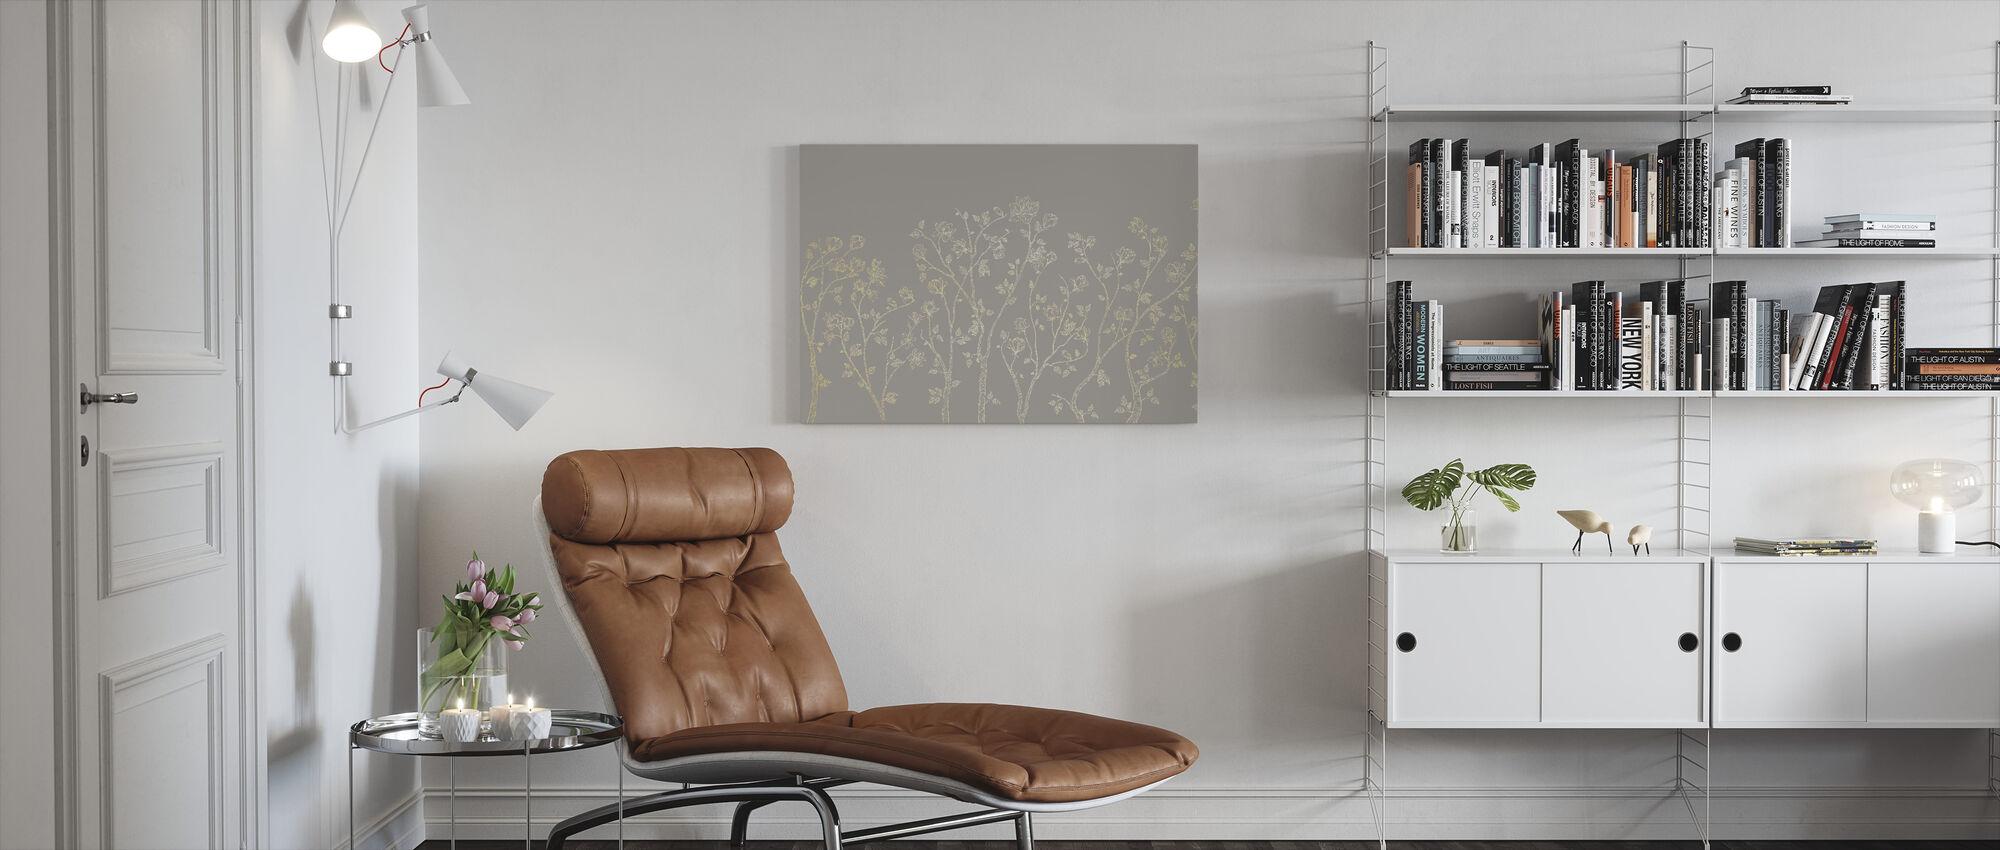 Crescent Vegetative - Beige - Canvas print - Living Room